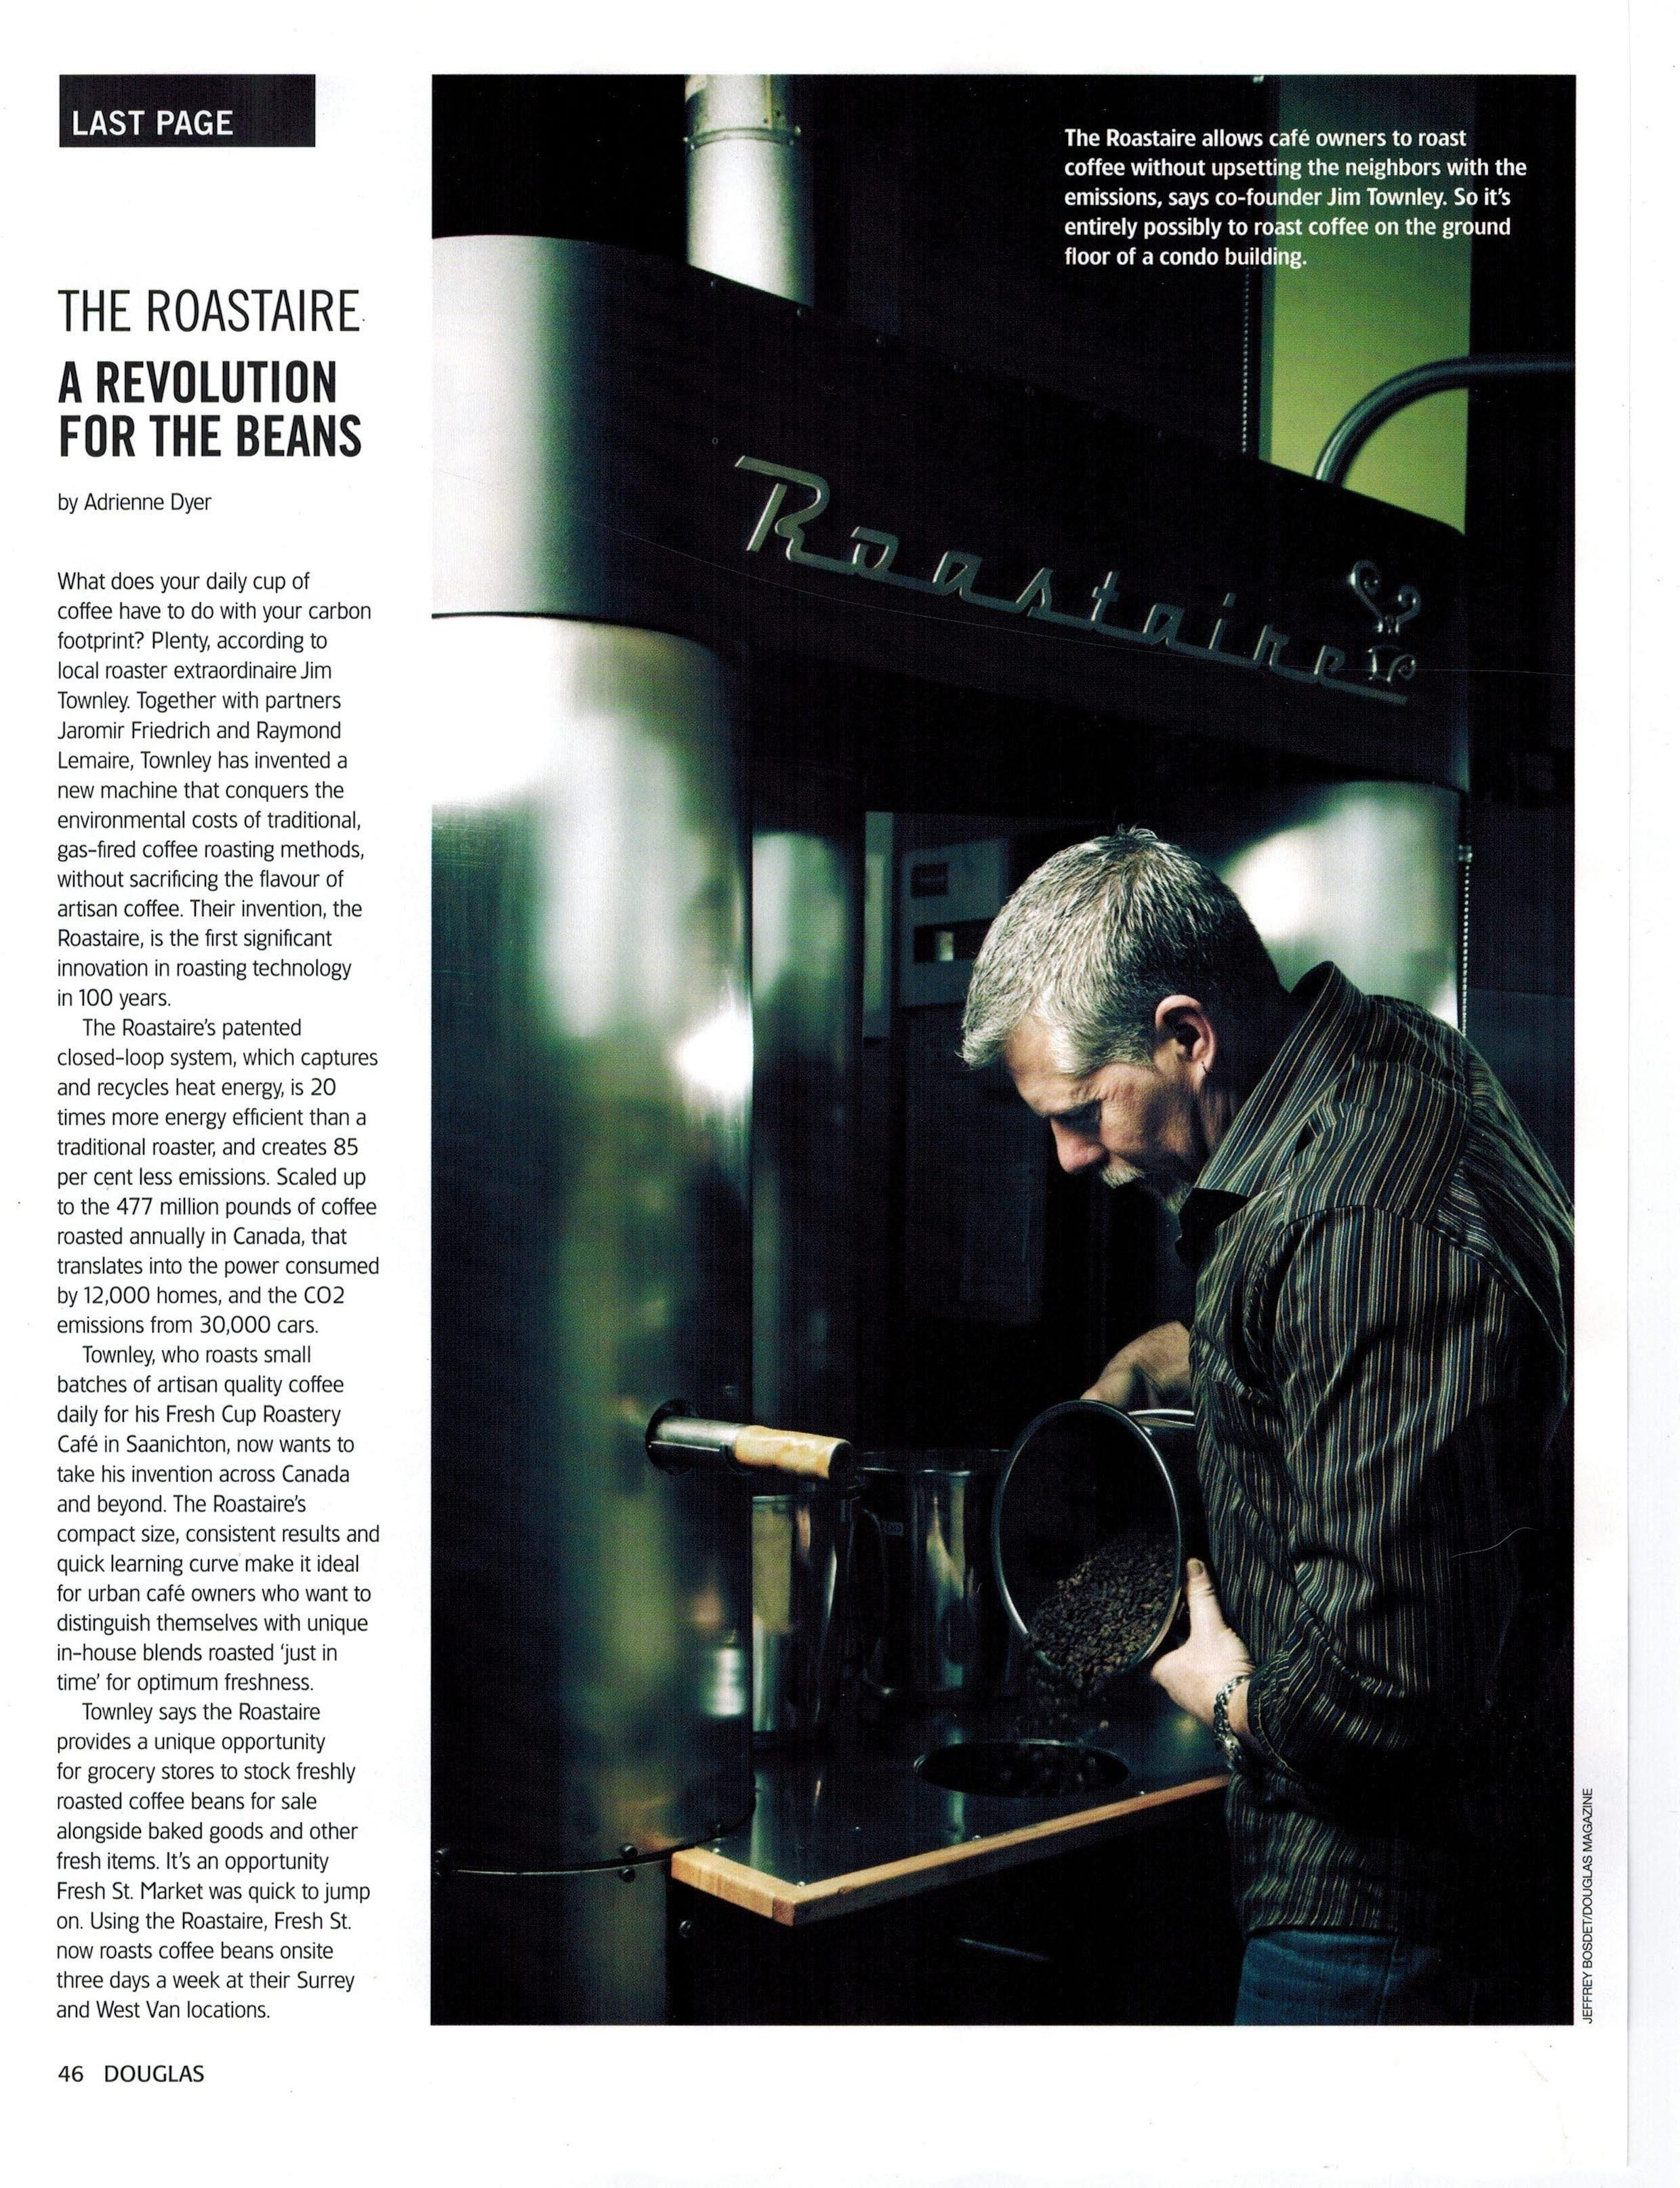 Download or view Douglas magazine article (April 2014)